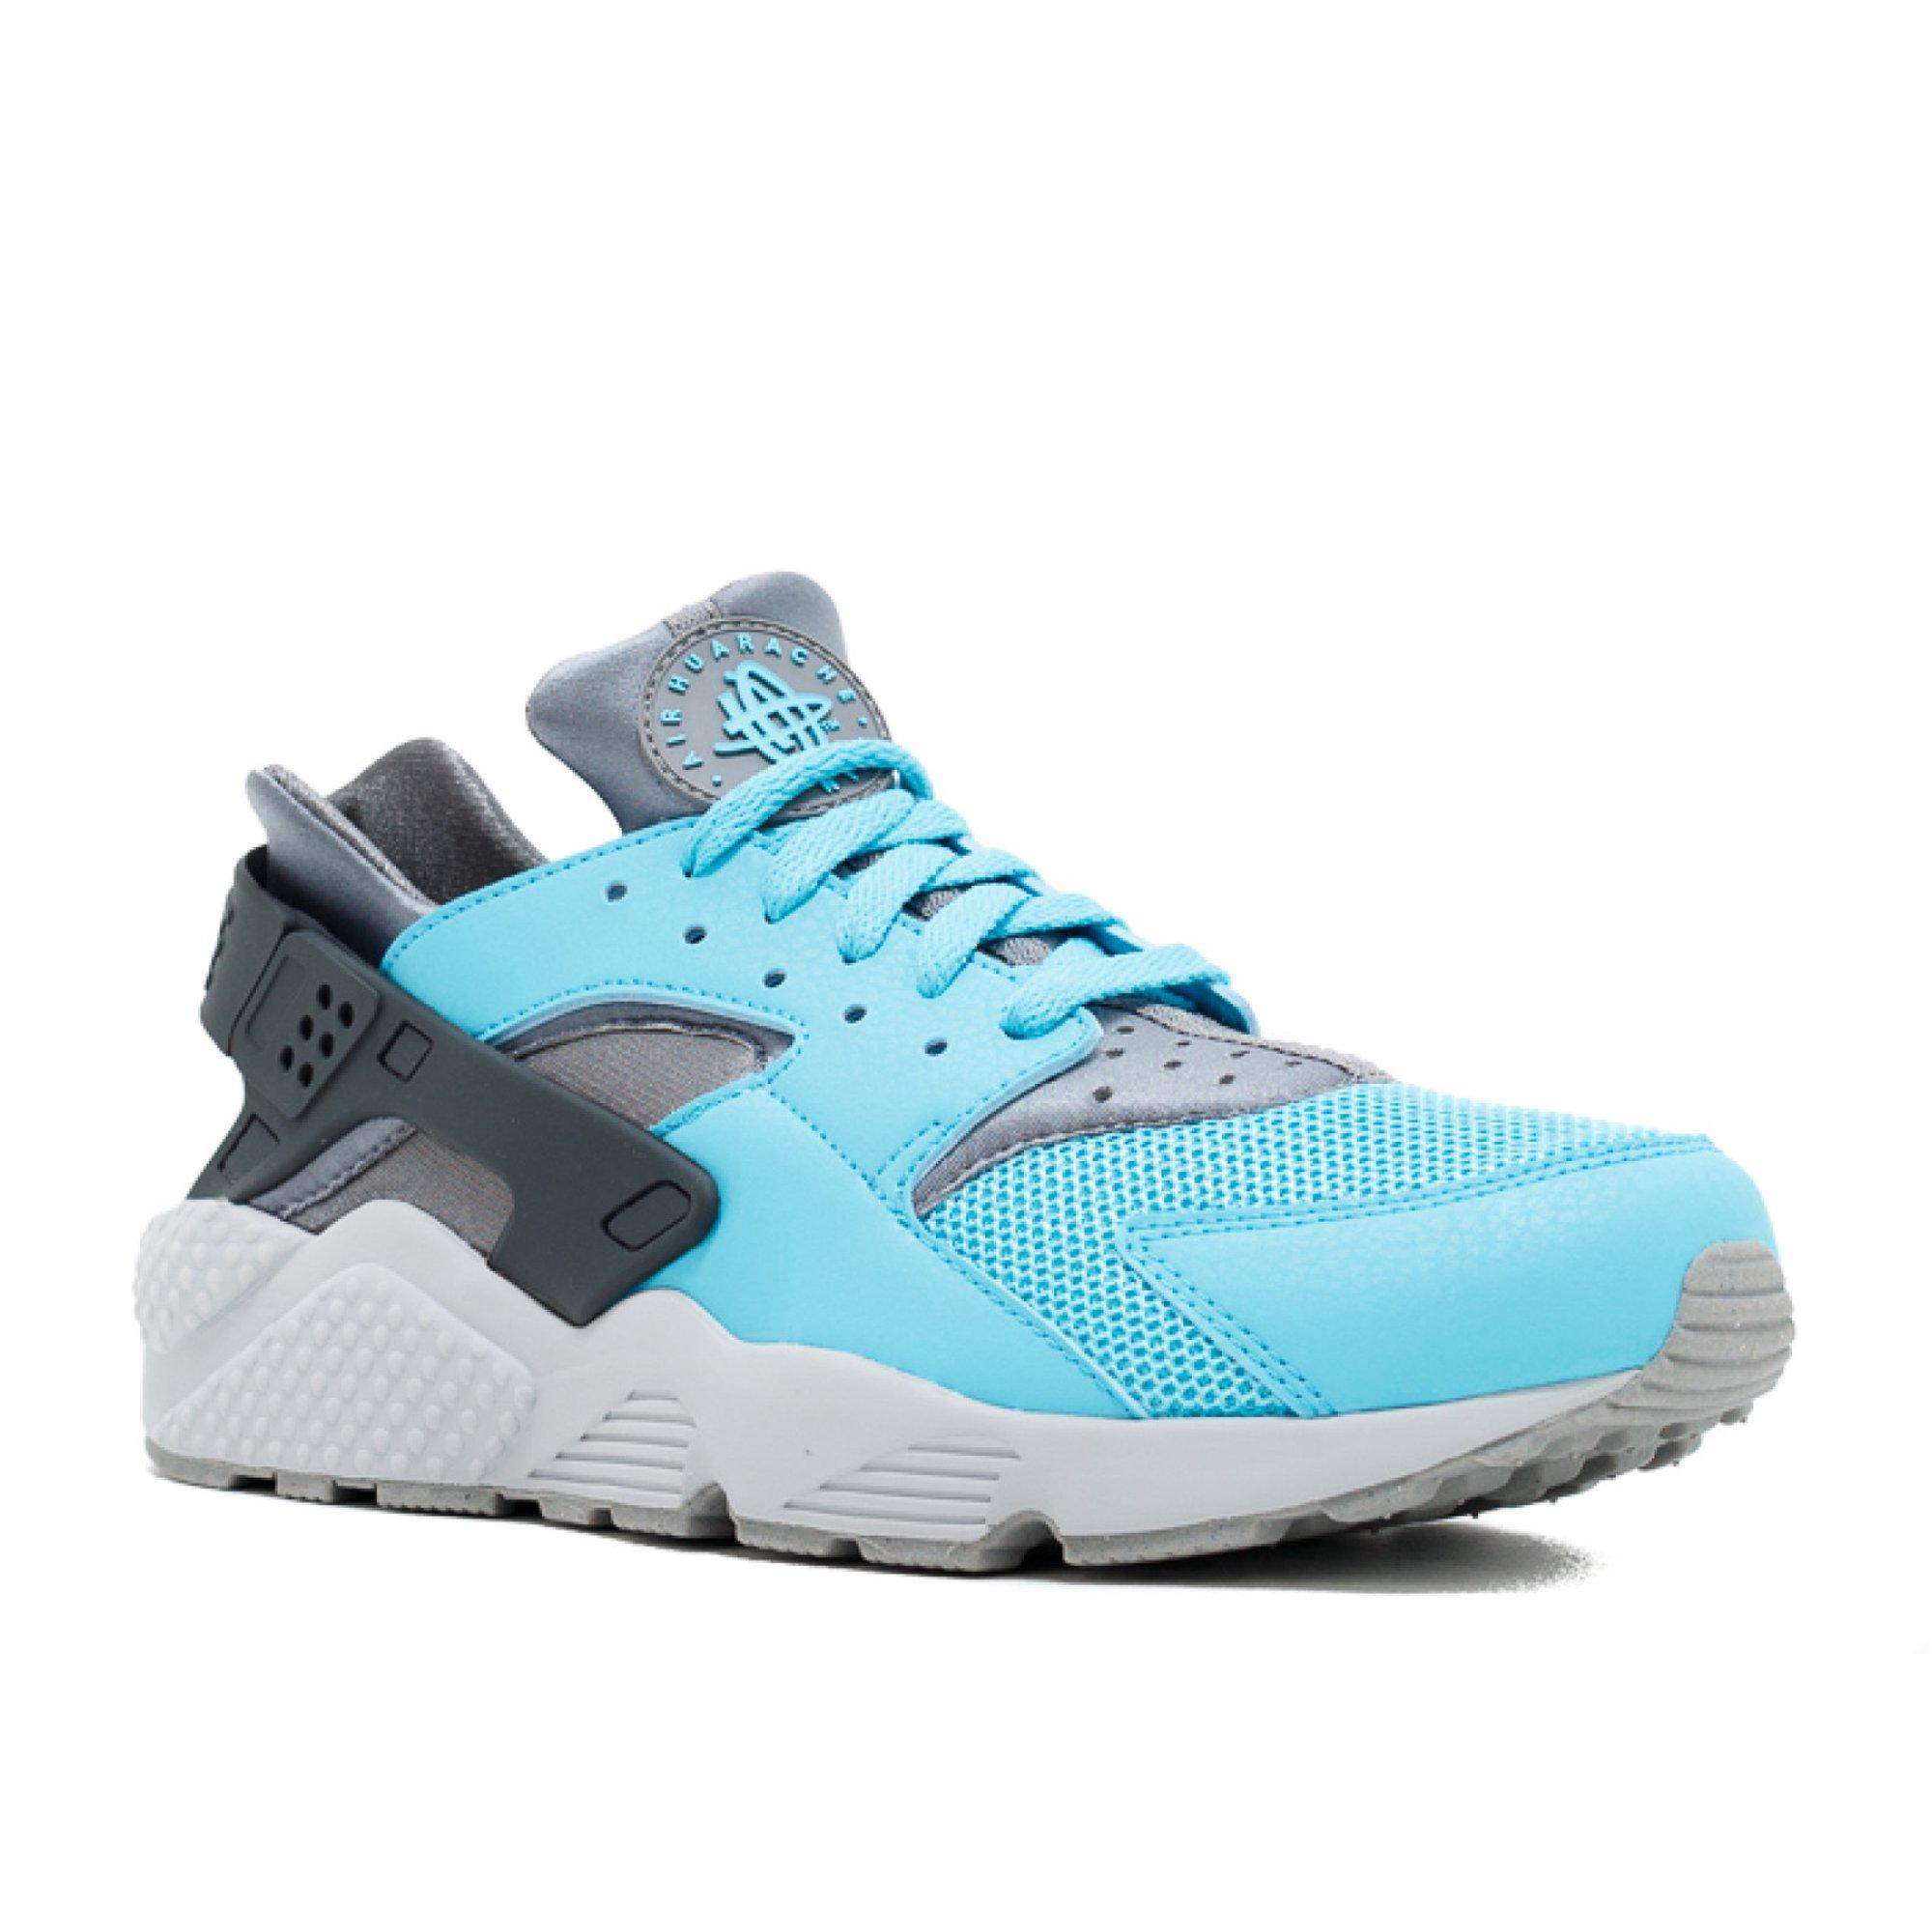 68c4ccd2e5e36 Nike - Men - Air Huarache - 318429-408 - Size 8